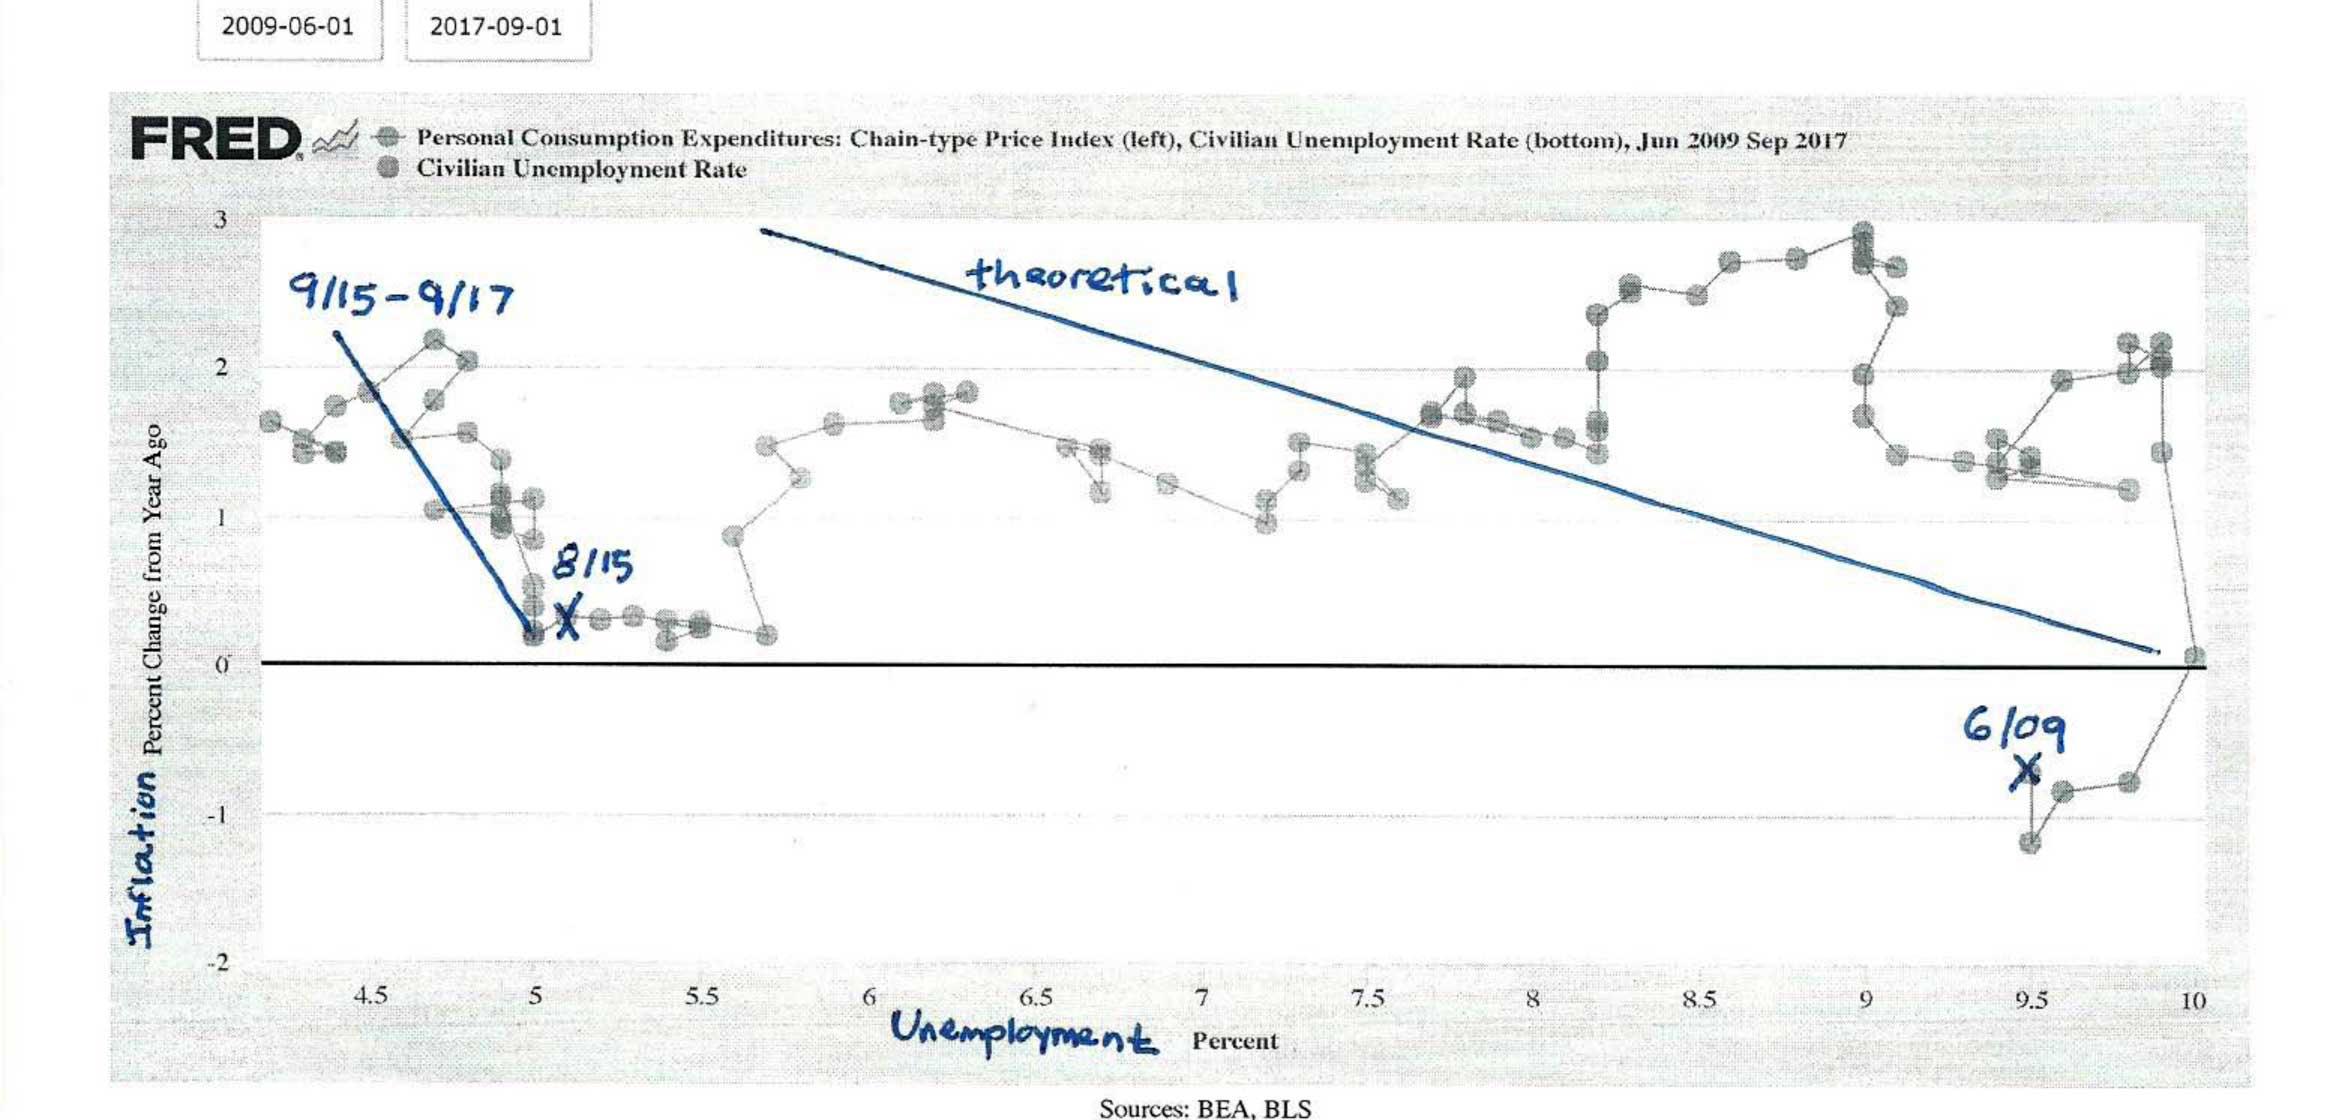 http://www.inv.com/graph1.jpg